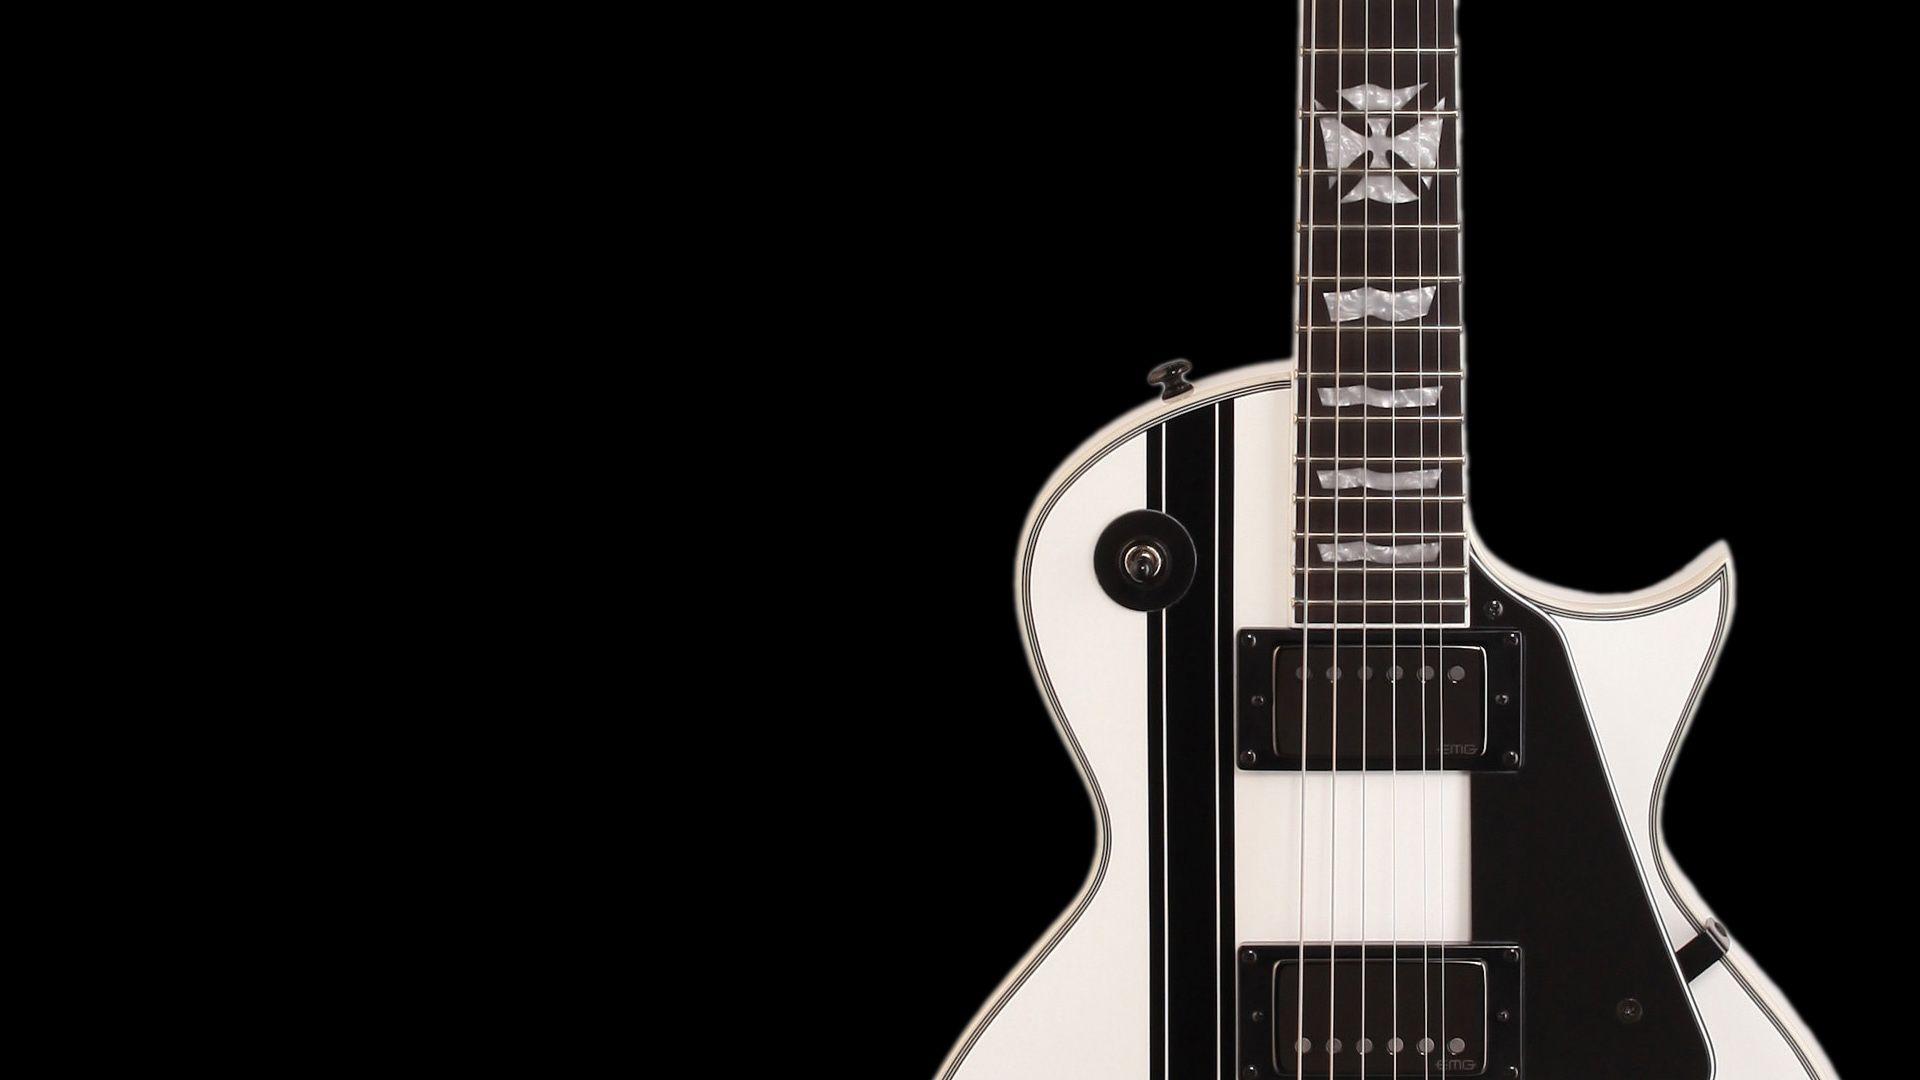 Electric Guitar white black, Image